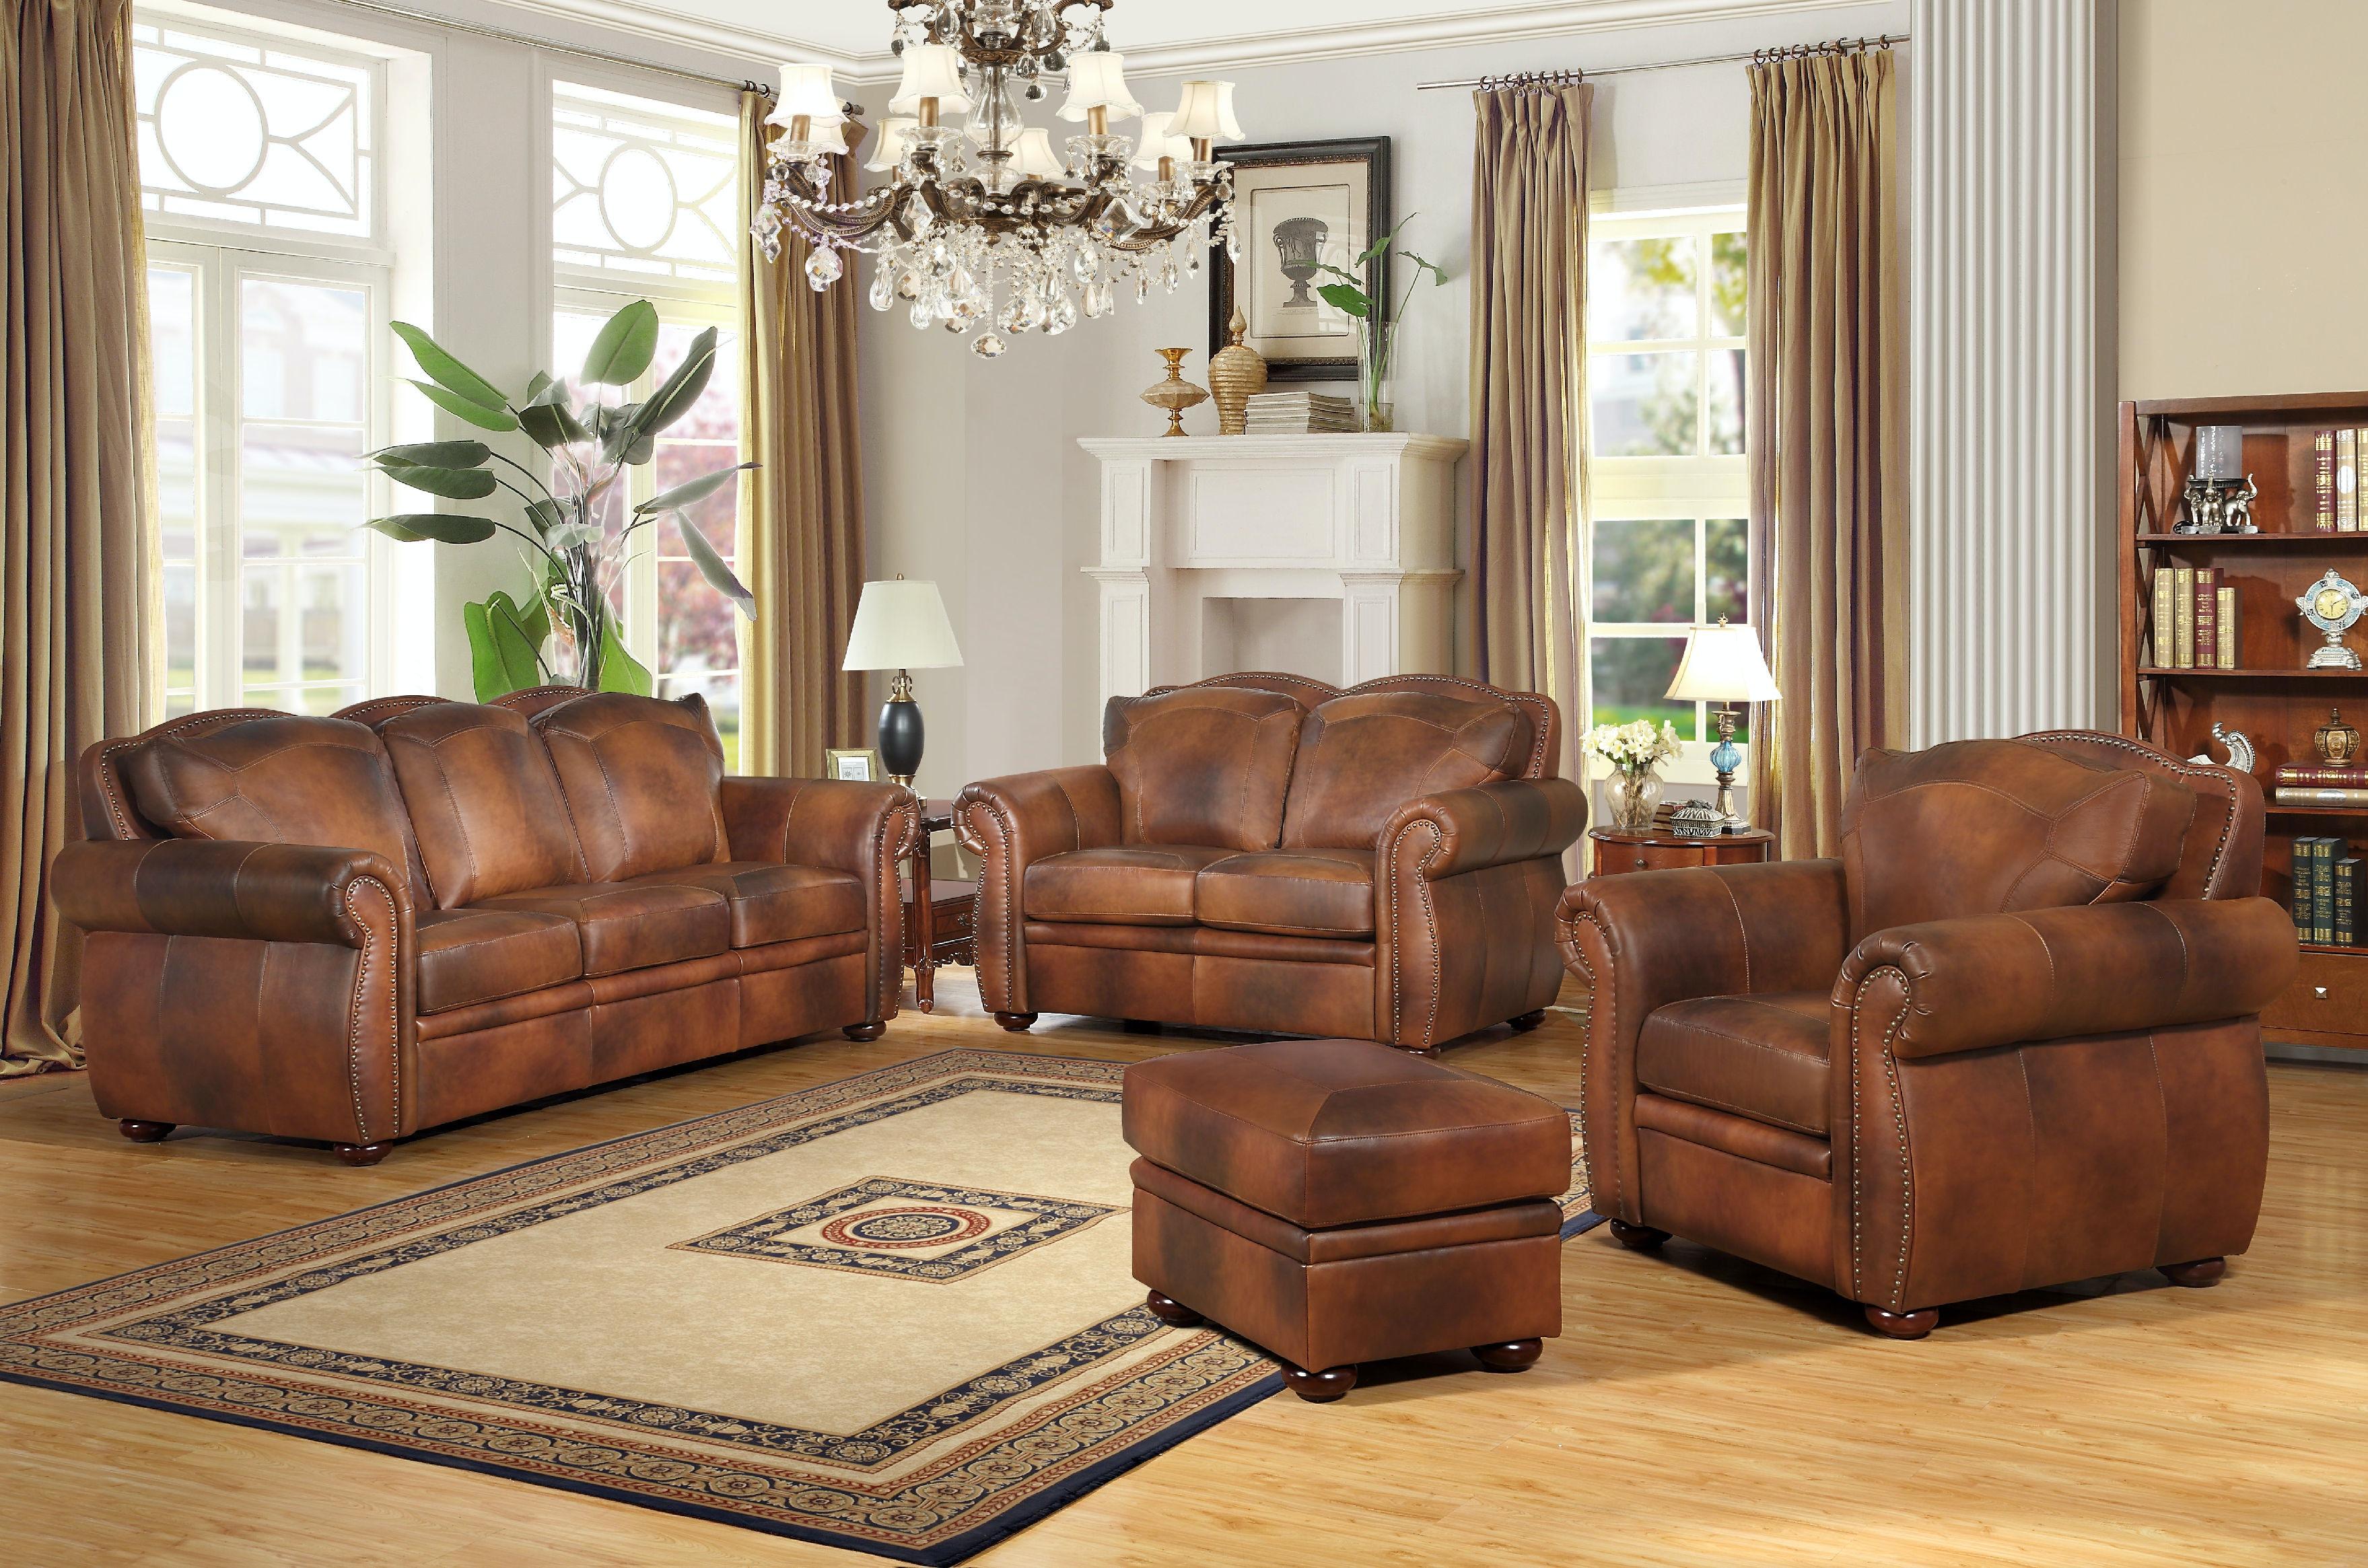 Leather Italia Arizona Loveseat 1444 6110 0204234